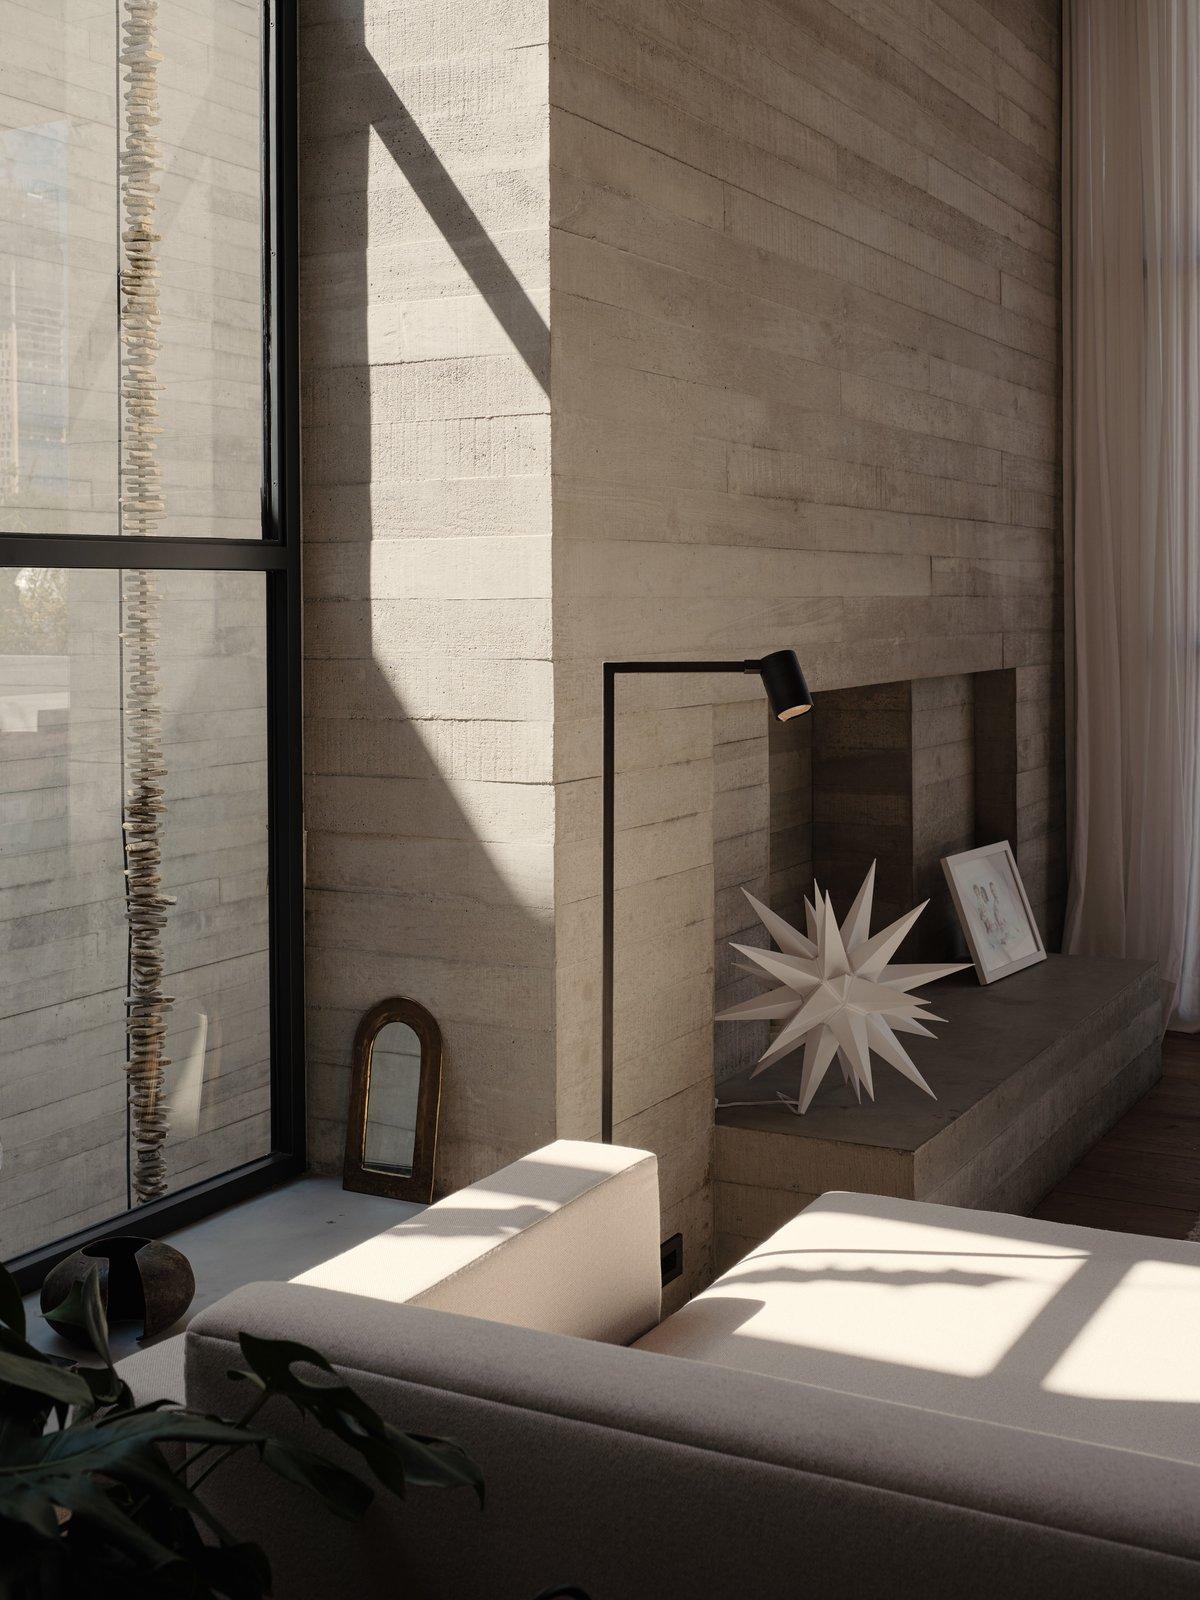 Tennyson 205 Rick Joy Polanco Apartment Living Room